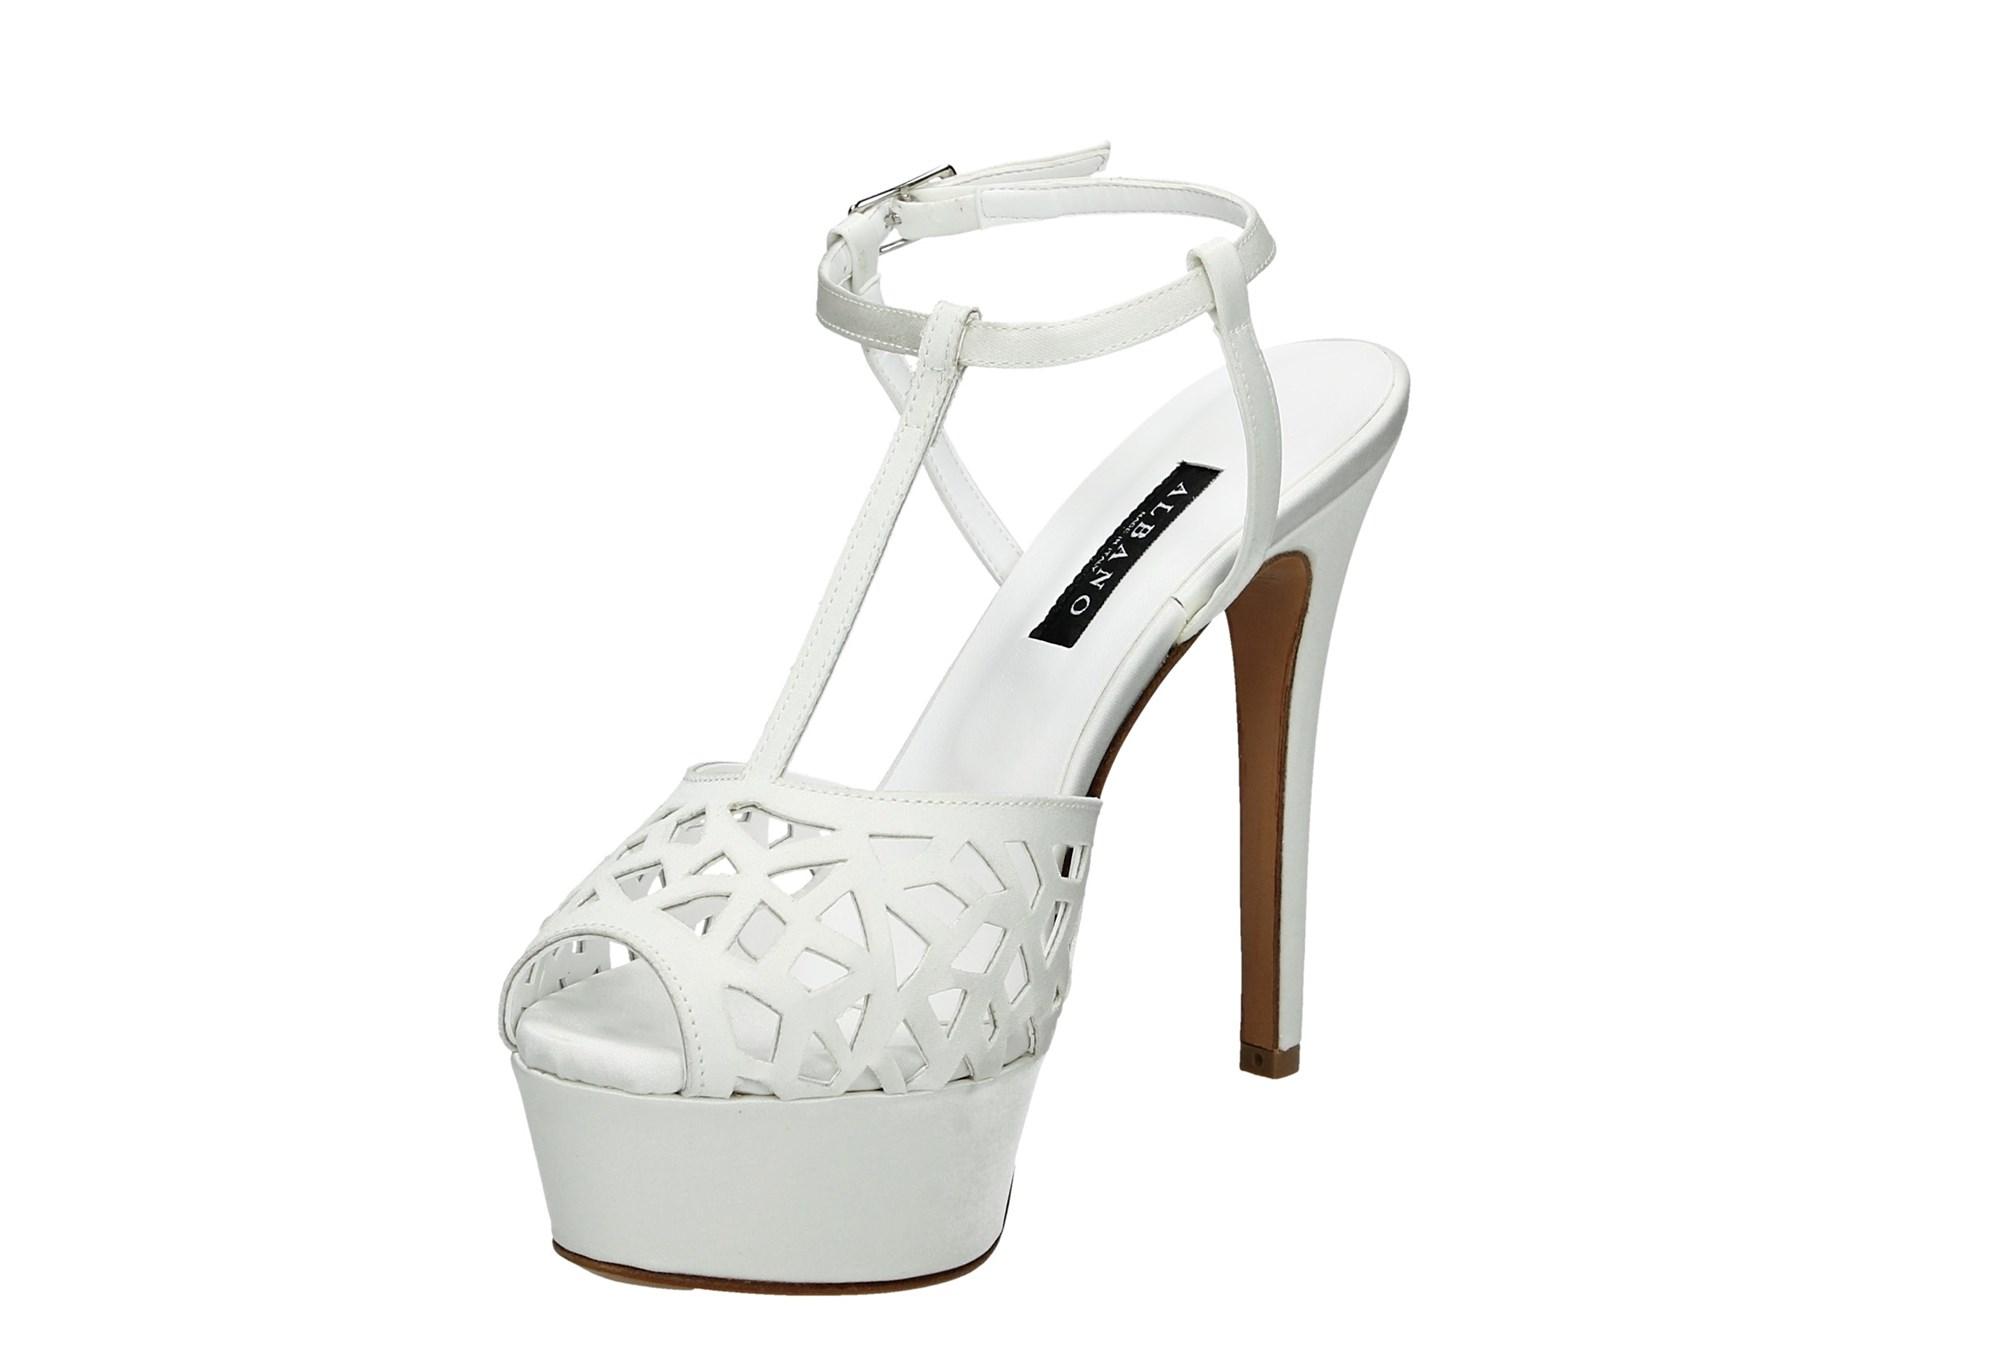 Donna Calzature Sandalo Bianco D1737 Principe Albano 8xqcIt0wvW